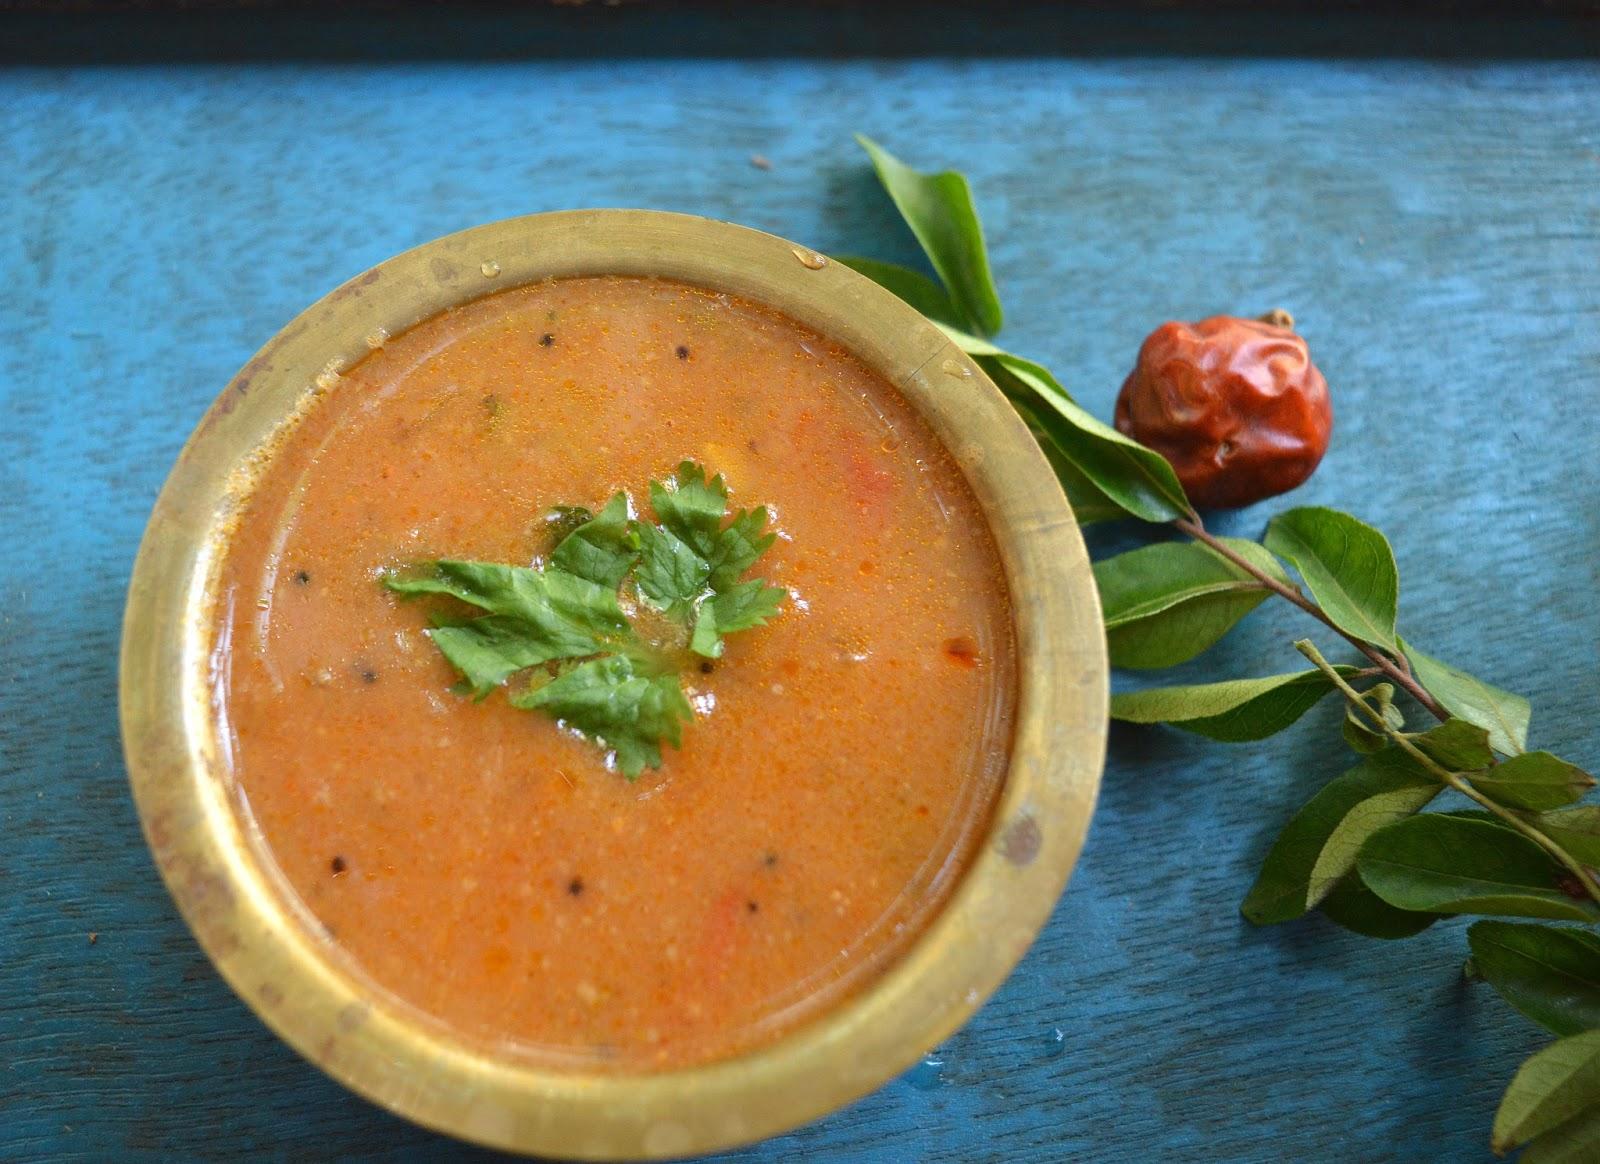 Babi s RecipesInstant Sambar 10 minutes/ No Dal Sambar Side